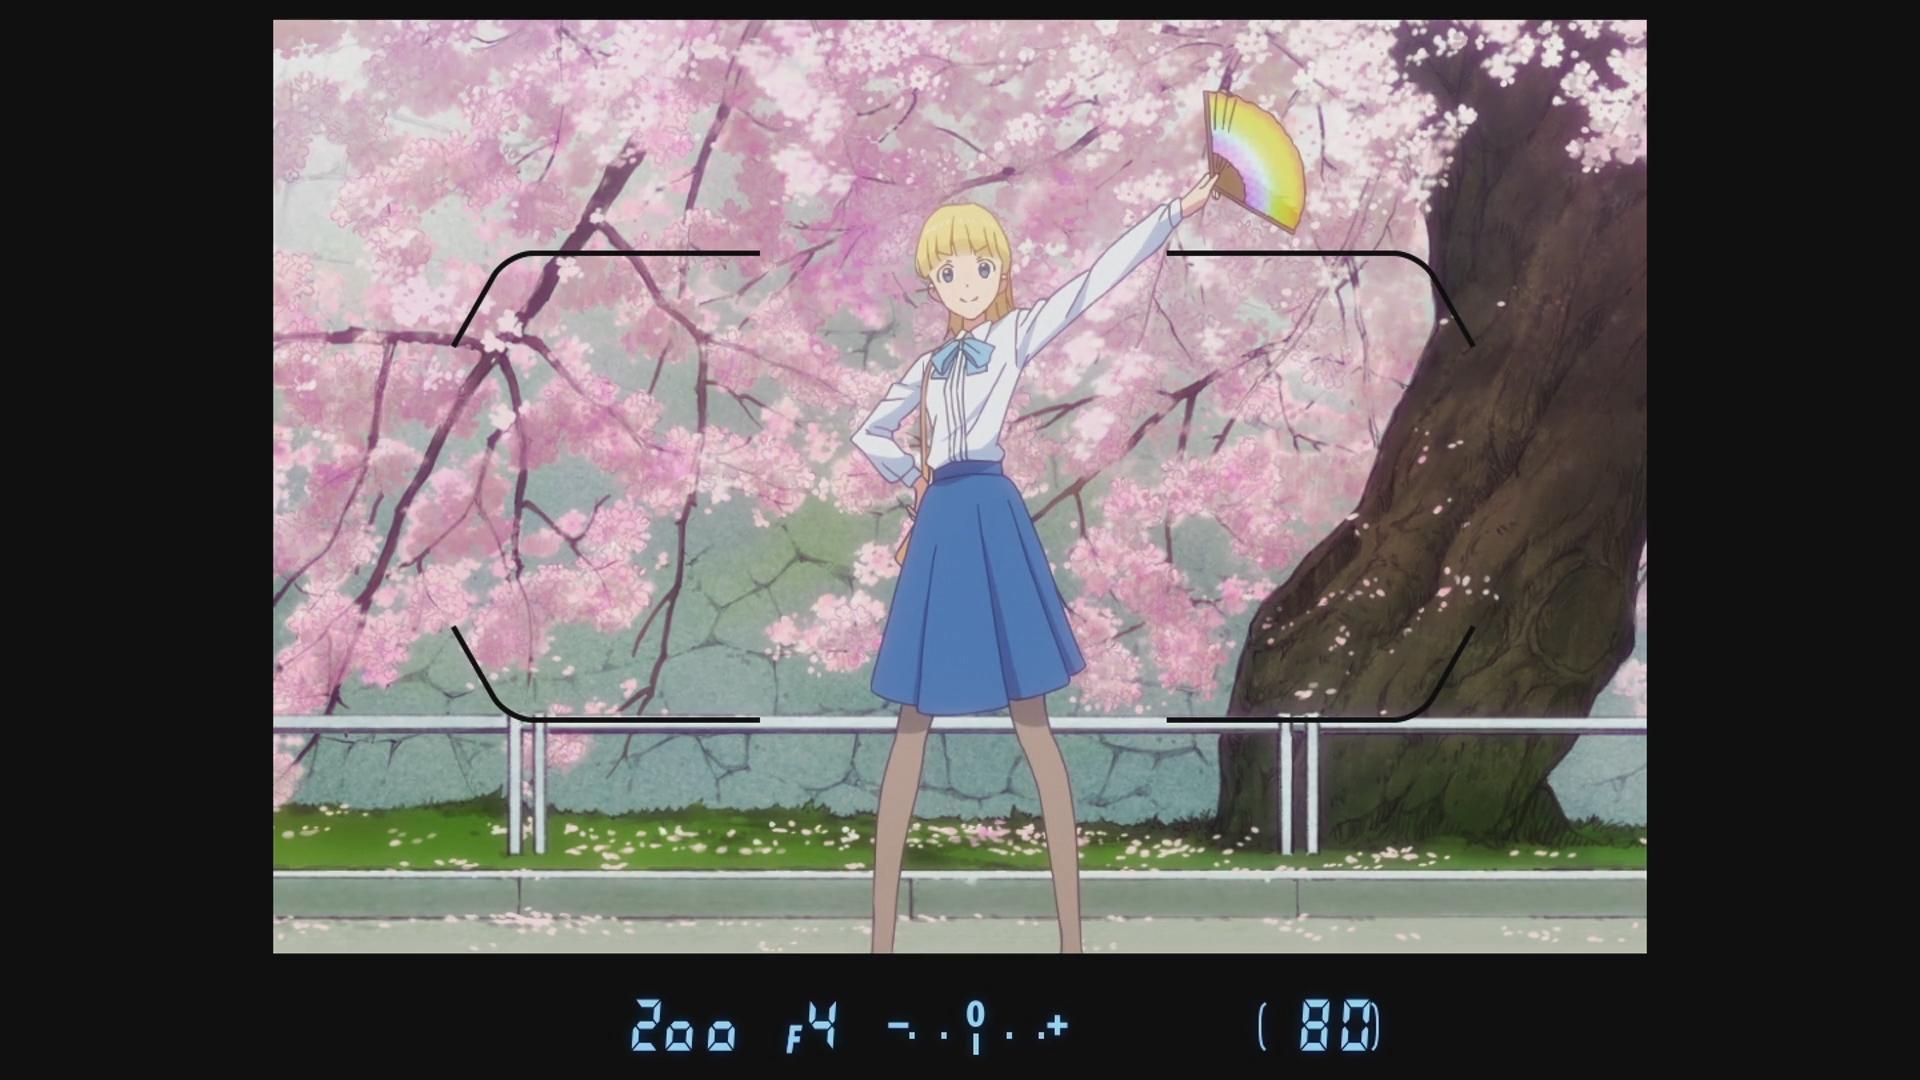 Tada Never Falls In Love Wallpaper Tada Kun Wa Koi Wo Shinai Ep 1 Barely Staying Afloat